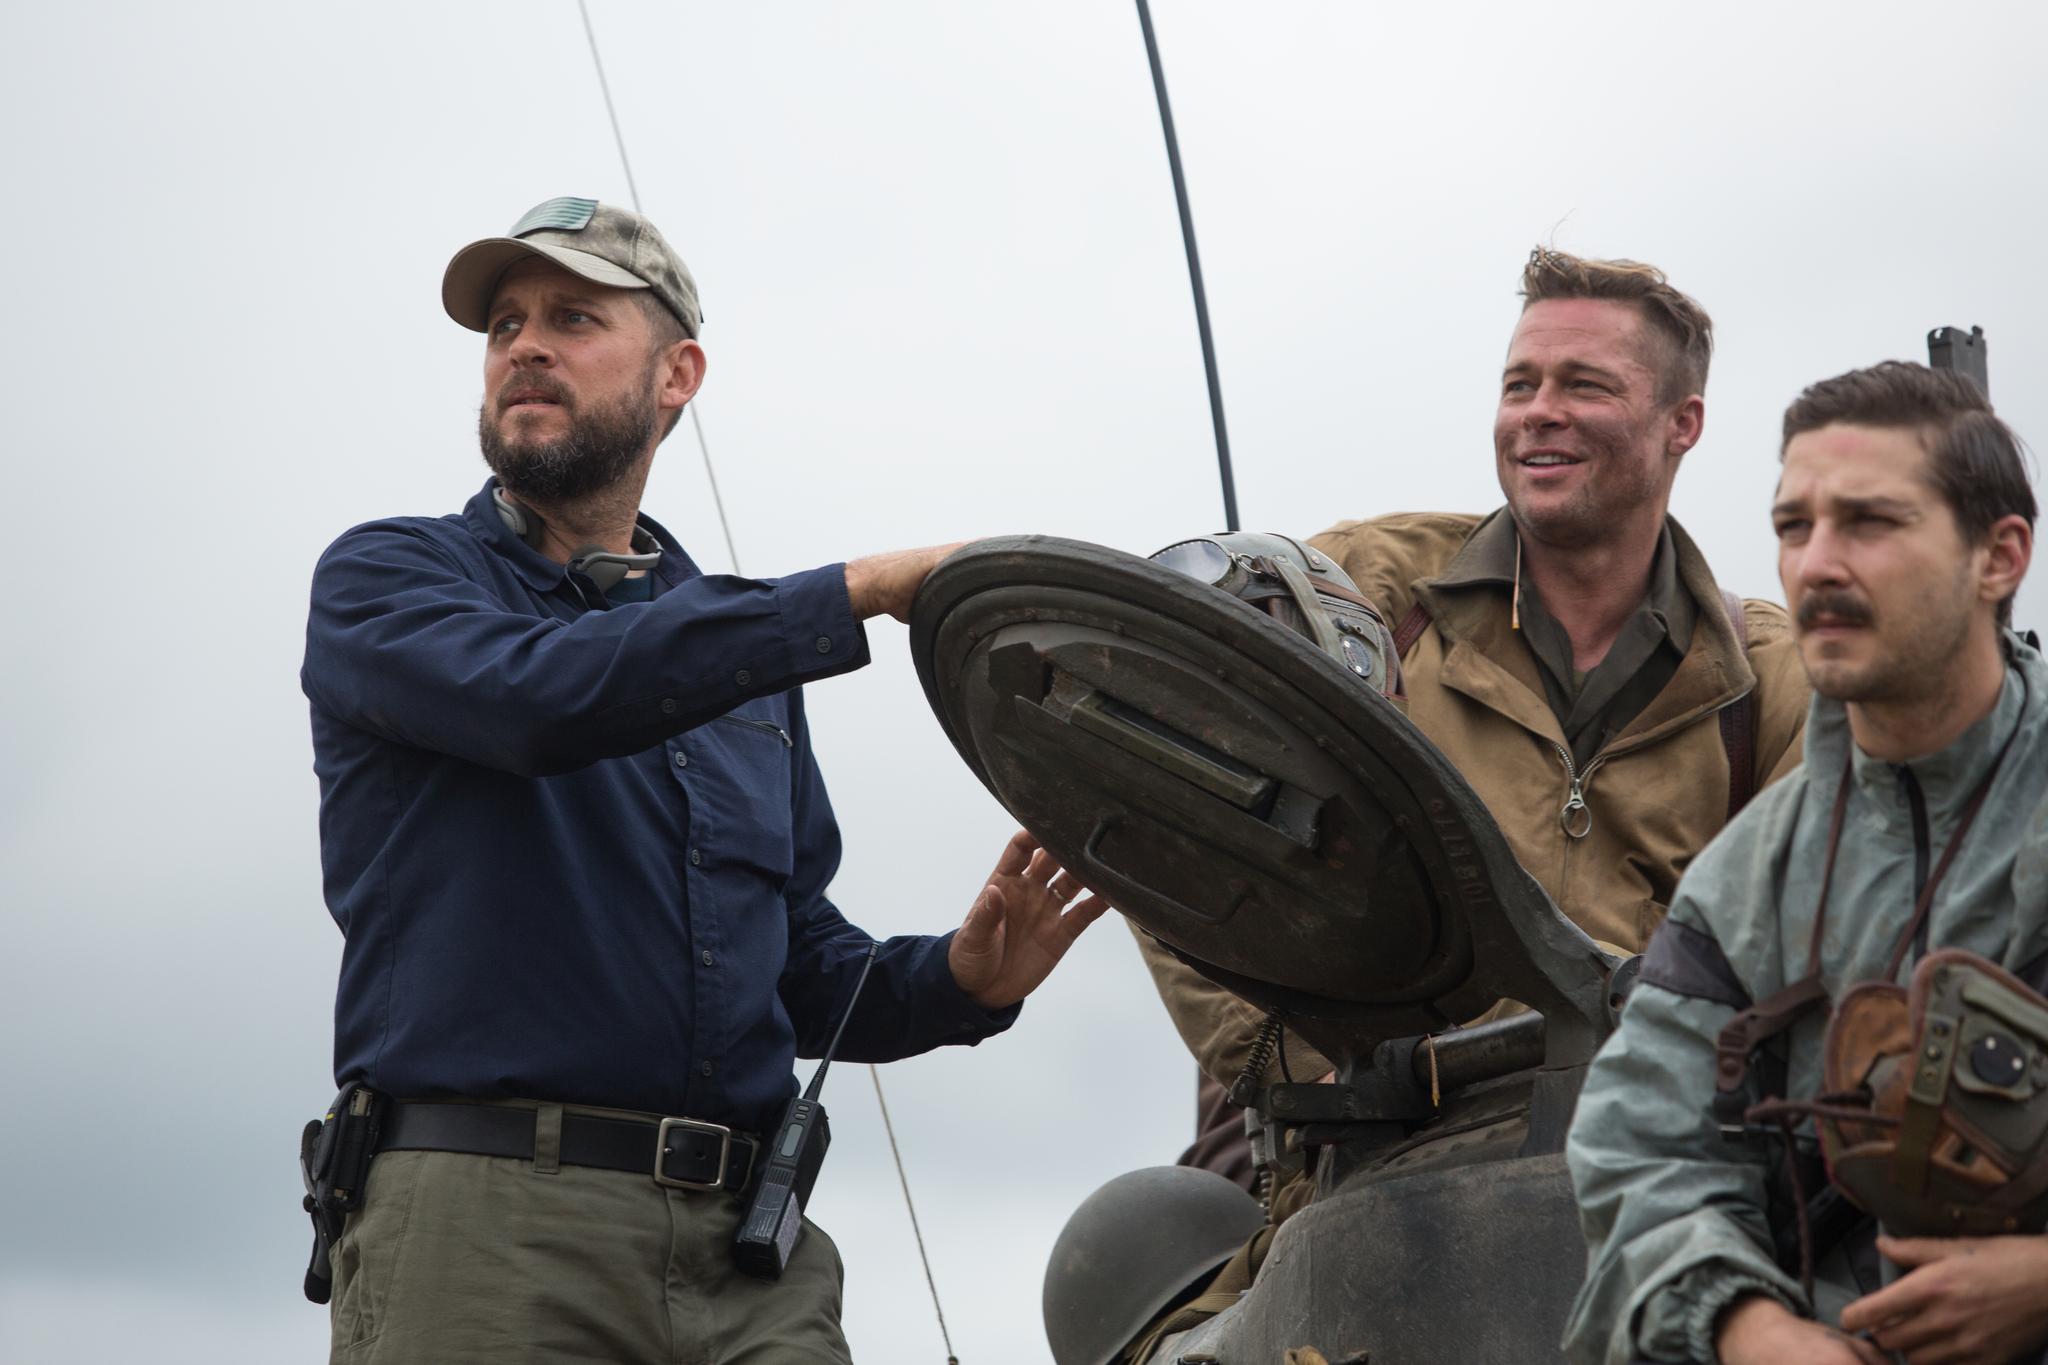 Brad Pitt, David Ayer and Shia LaBeouf in Inirsis (2014)